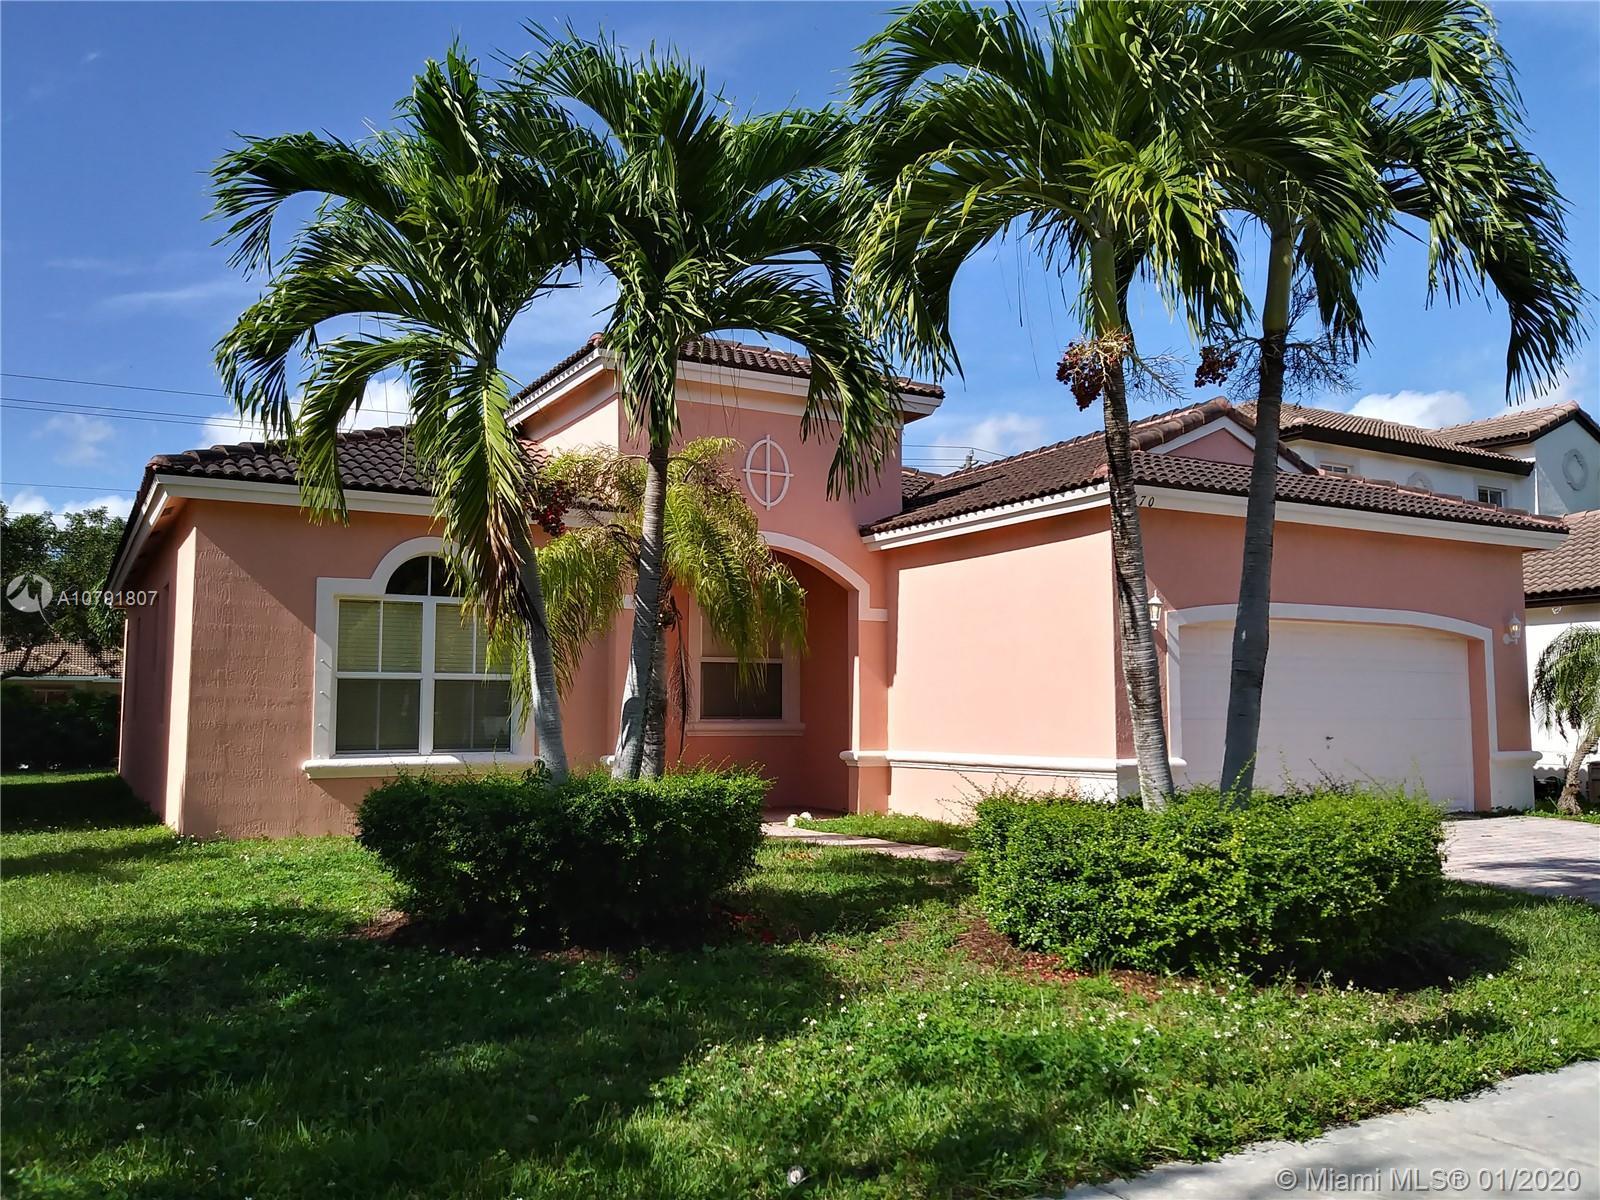 1770 SE 18th Ter, Homestead, FL 33035 - Homestead, FL real estate listing